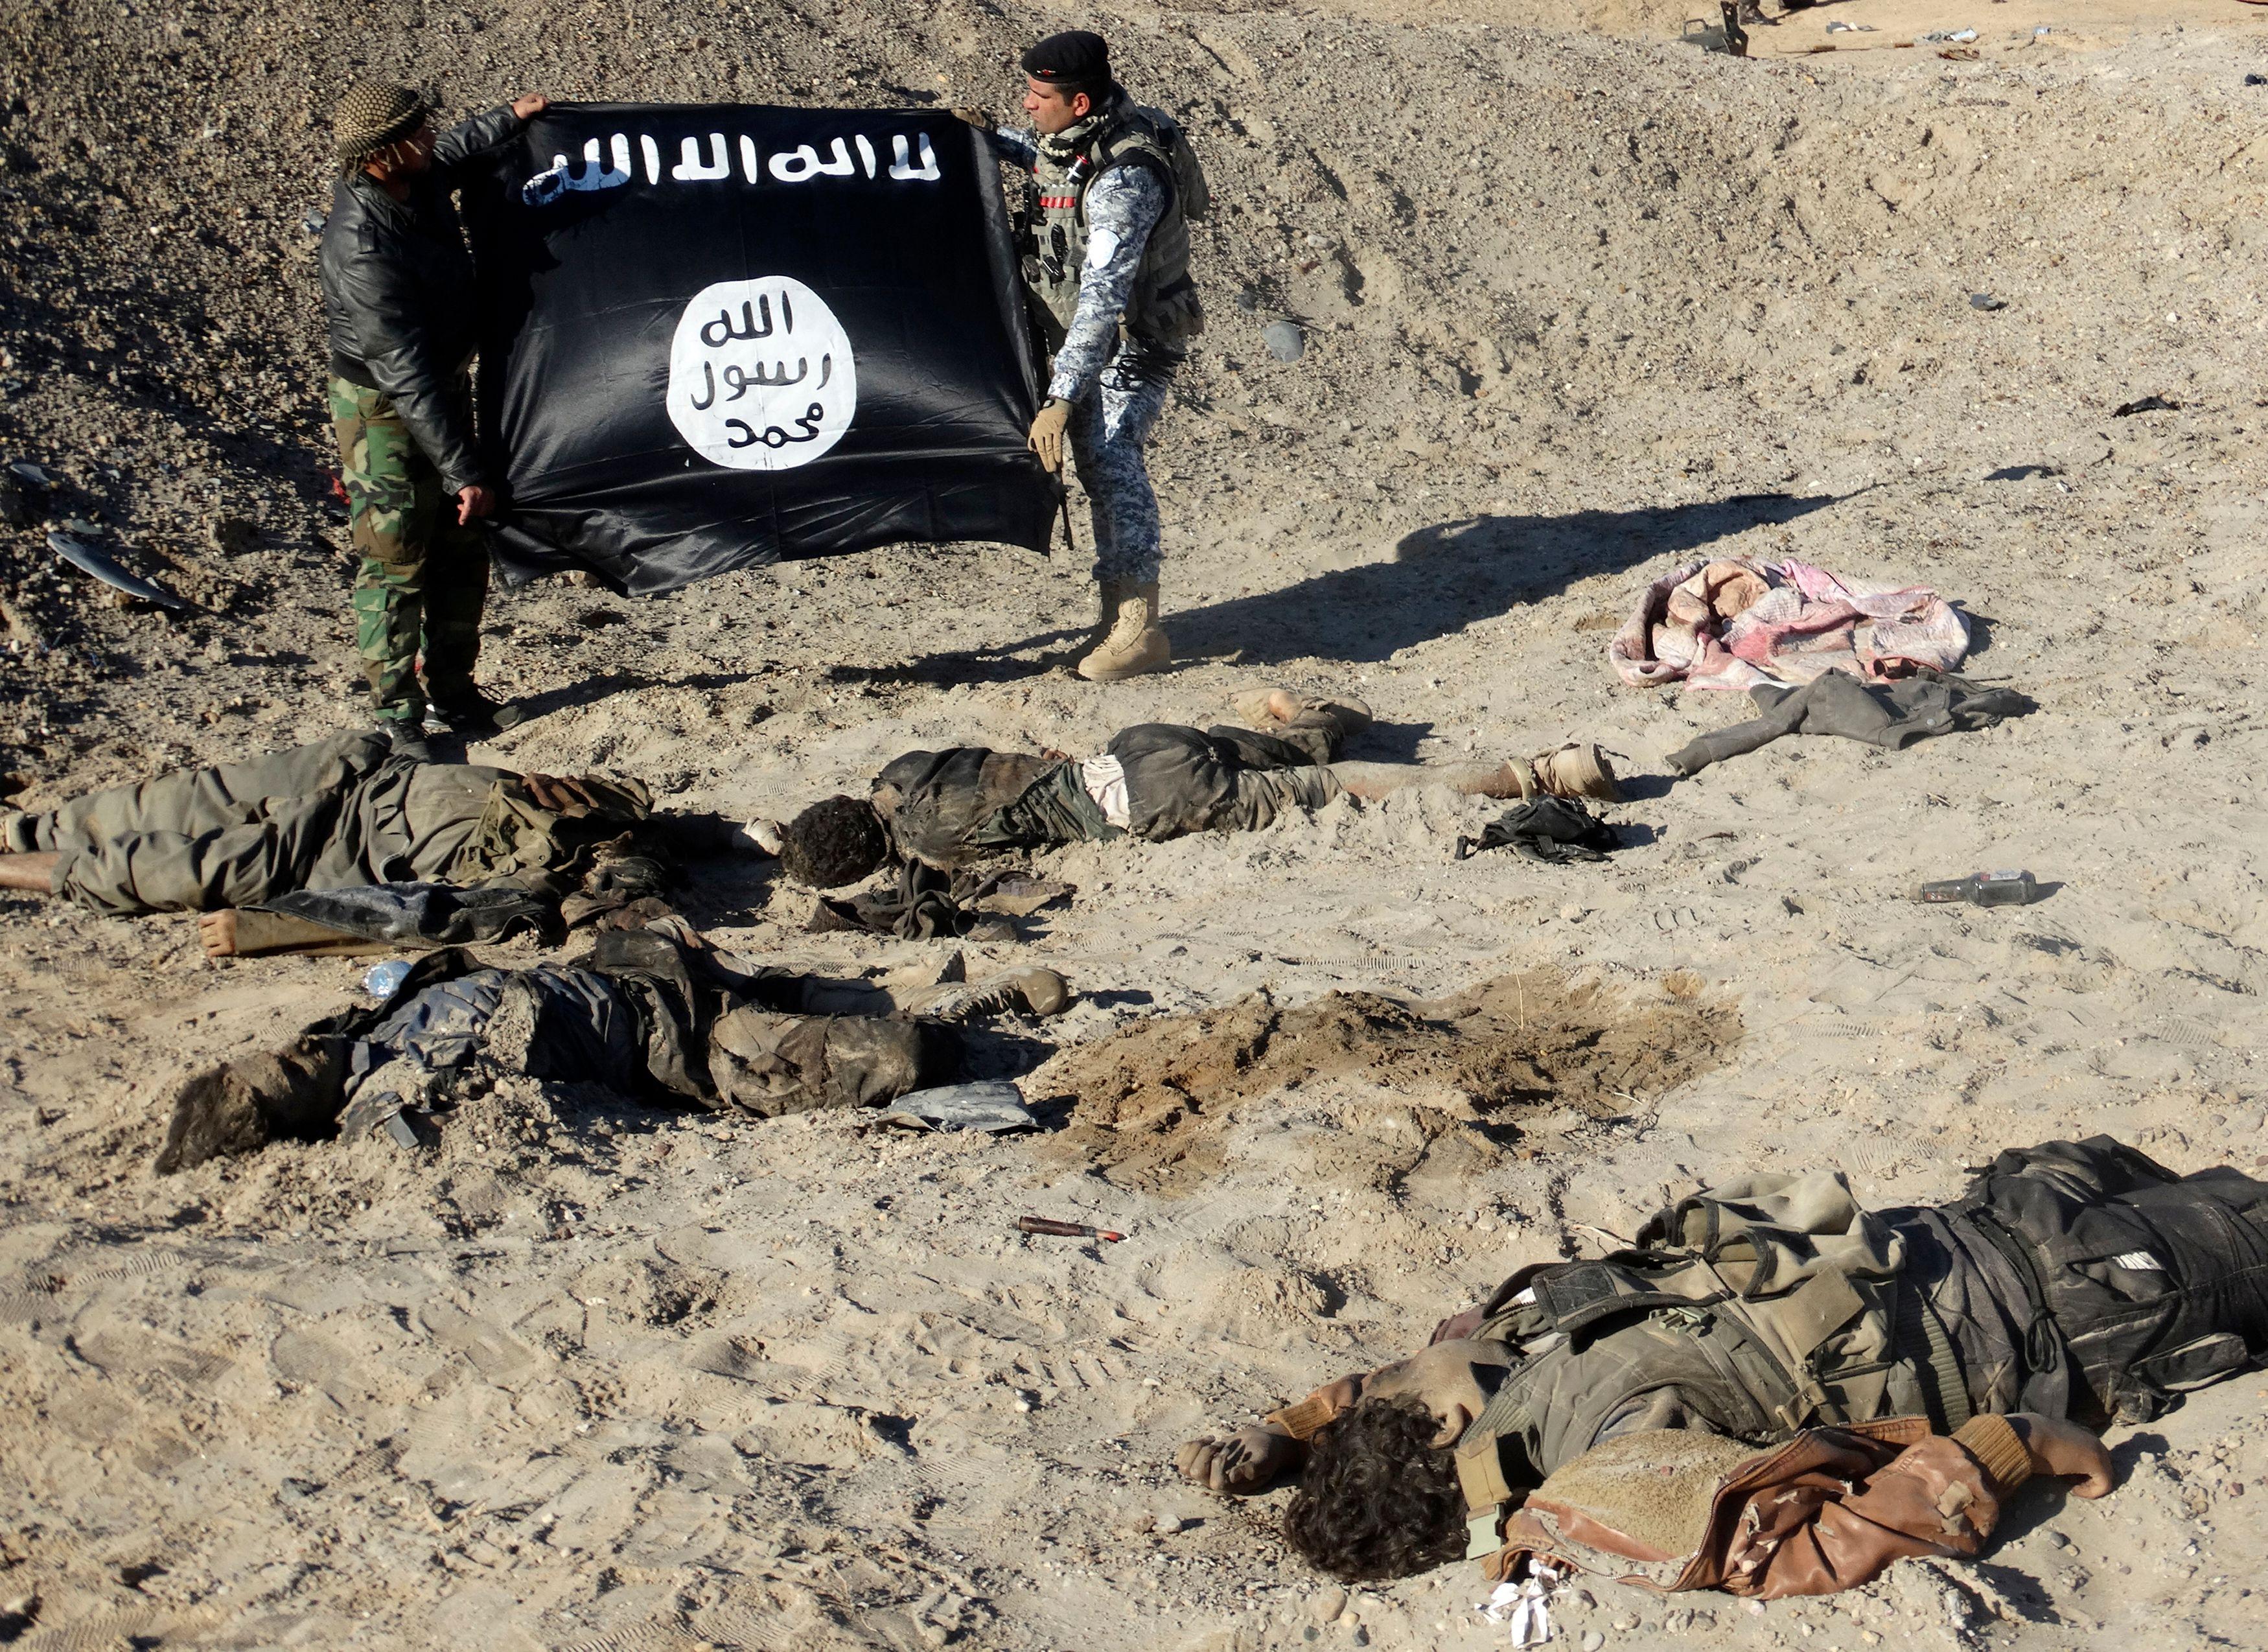 Des djihadistes francophones repérés parmi les troupes de Daech en Afghanistan